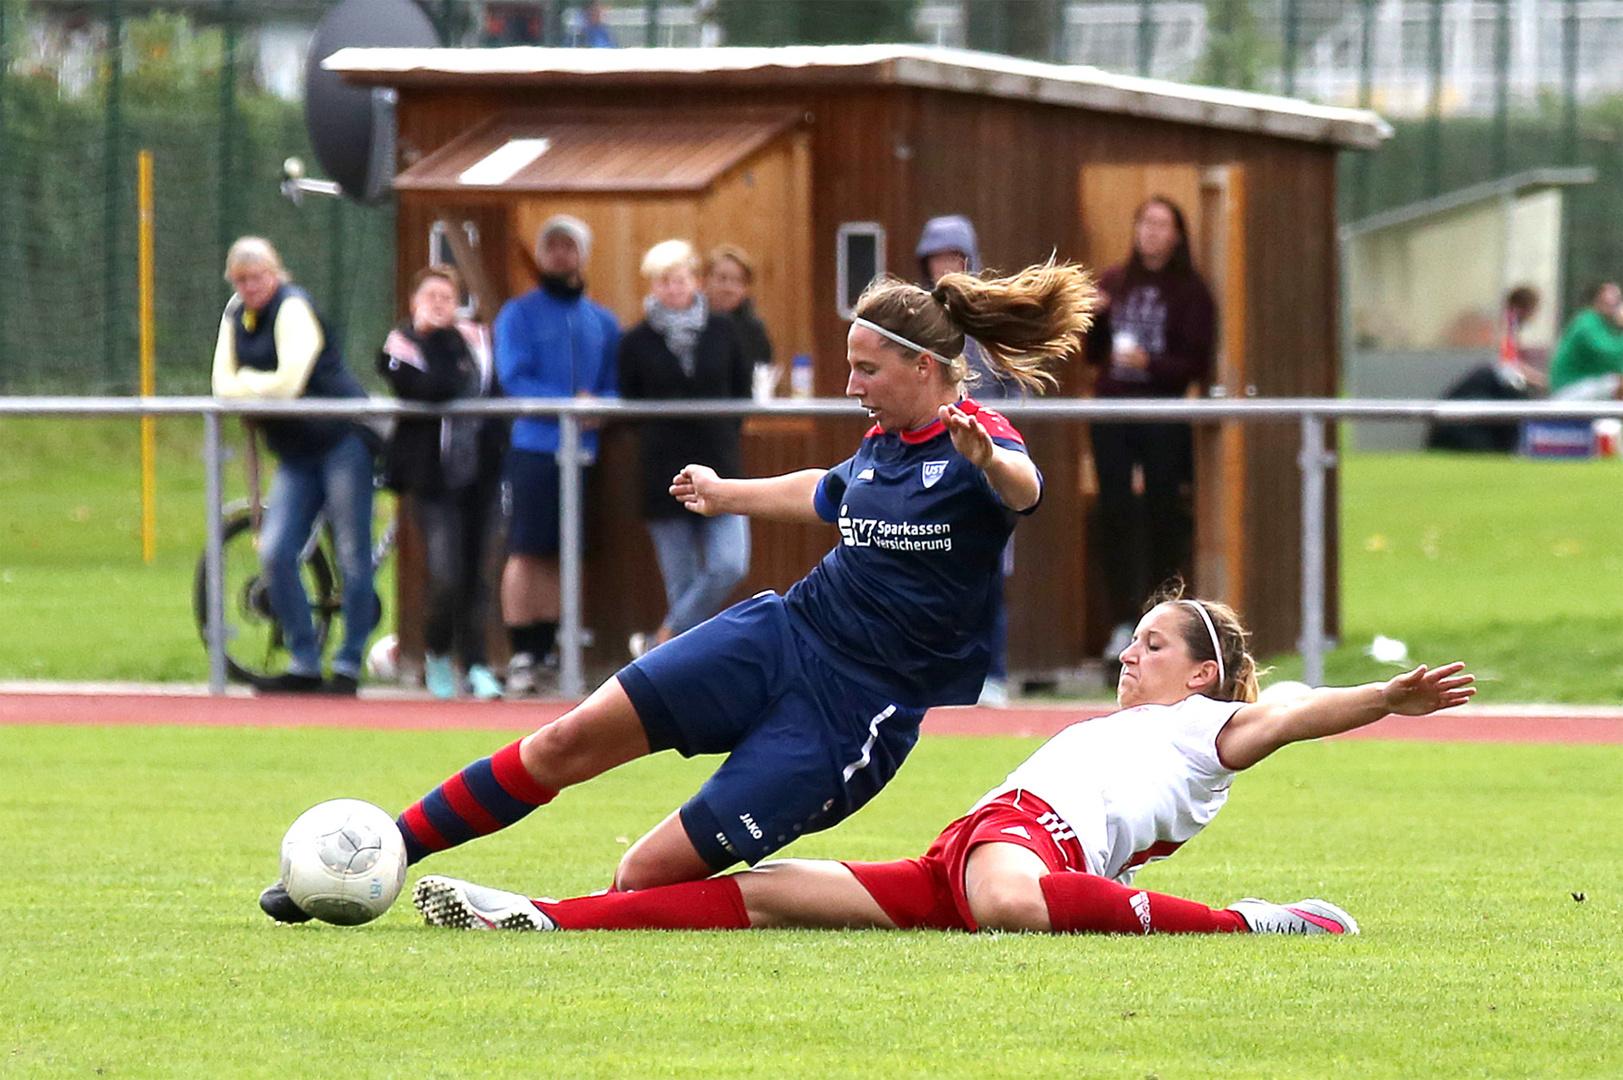 Isabell Welke Im Zweikampf Foto Bild Sport Ballsport